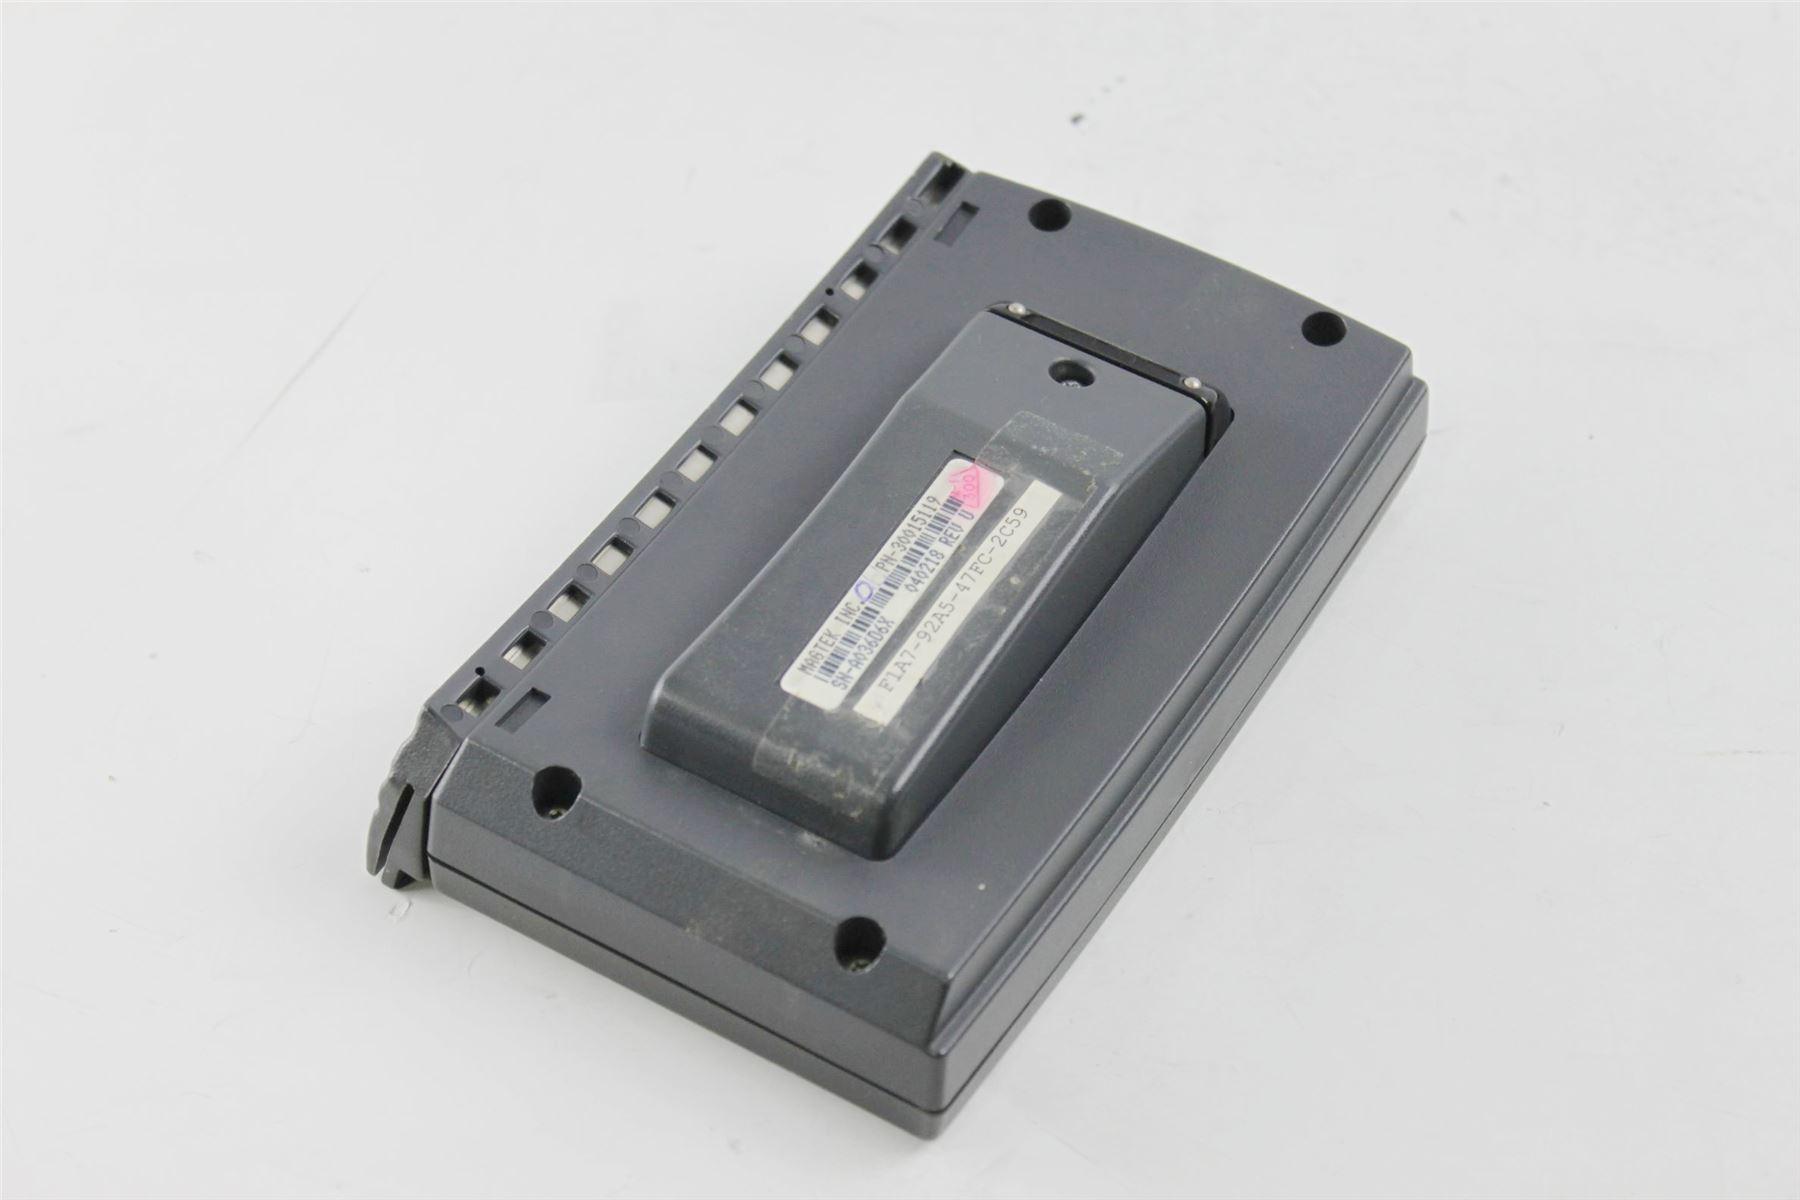 MagTek-IntelliPIN-Portable-Magnetic-Strip-Card-Reader-W-O-